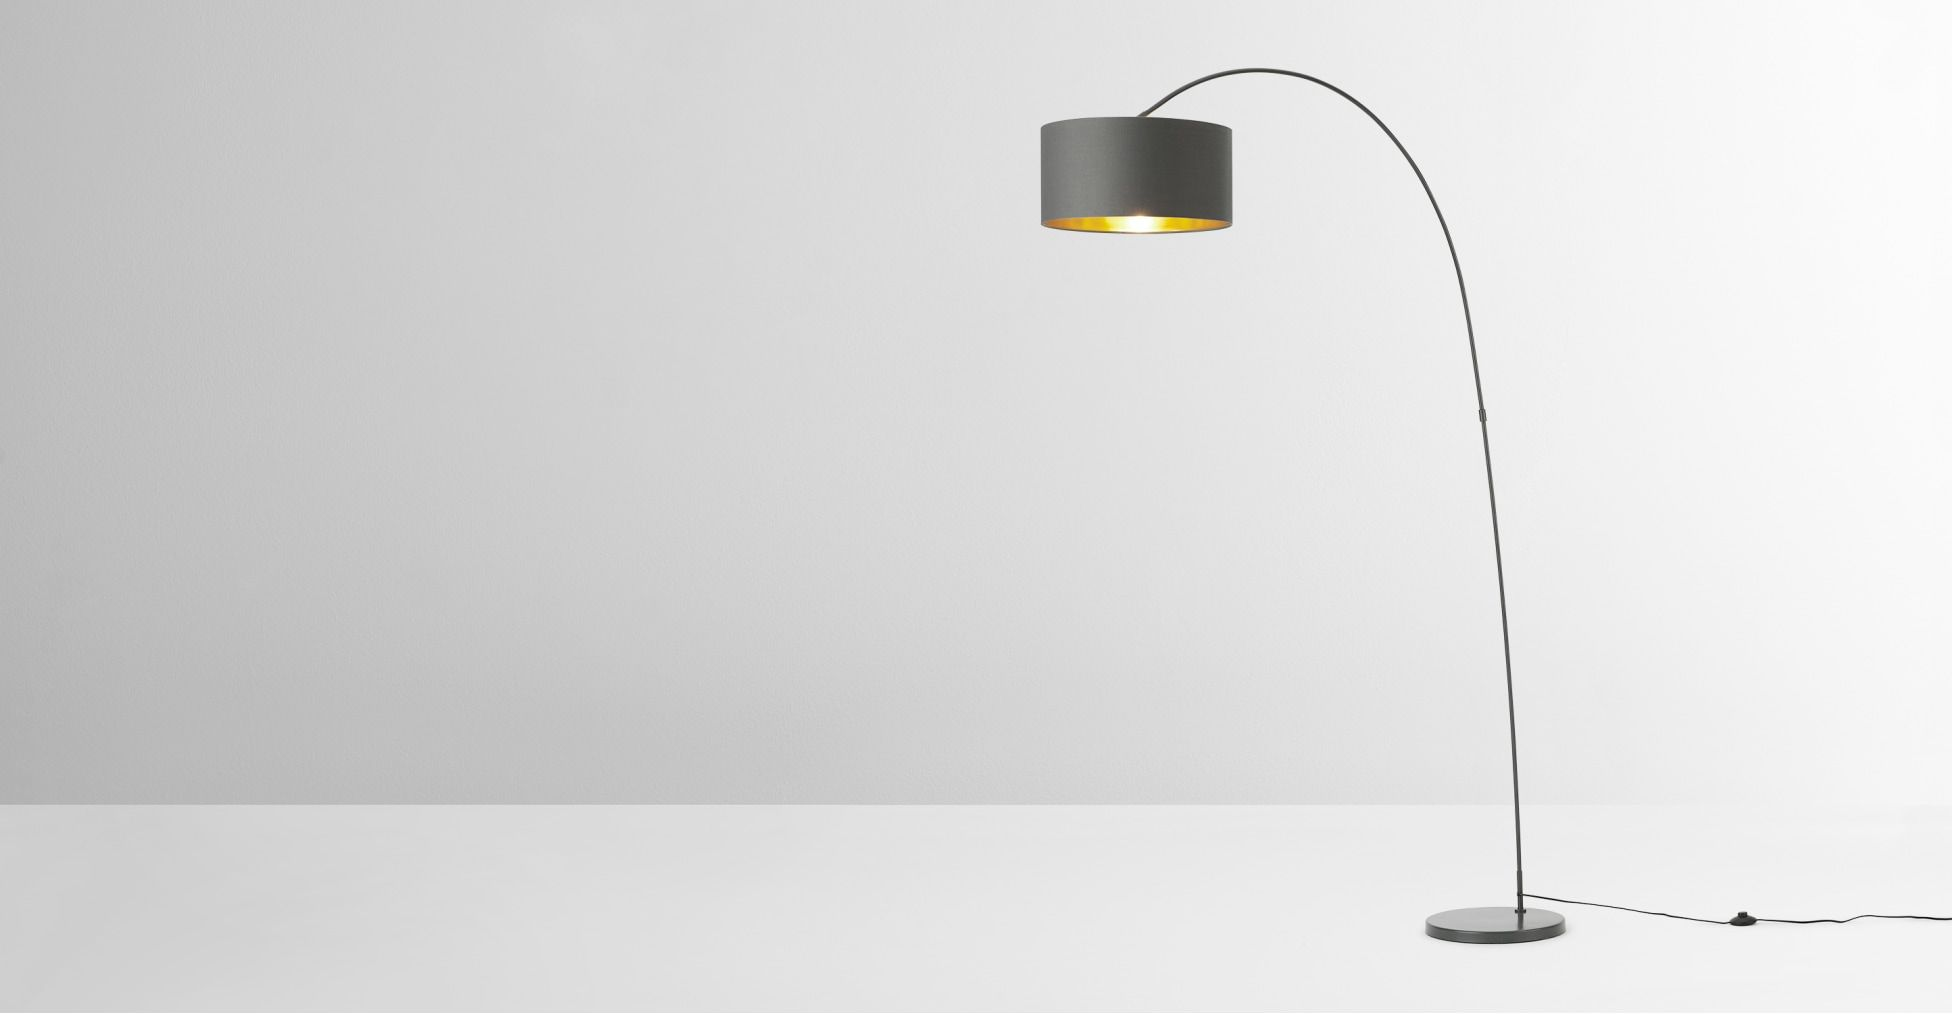 Sweep Stehlampe Grau Und Messing In 2020 Stehlampe Bodenlampe